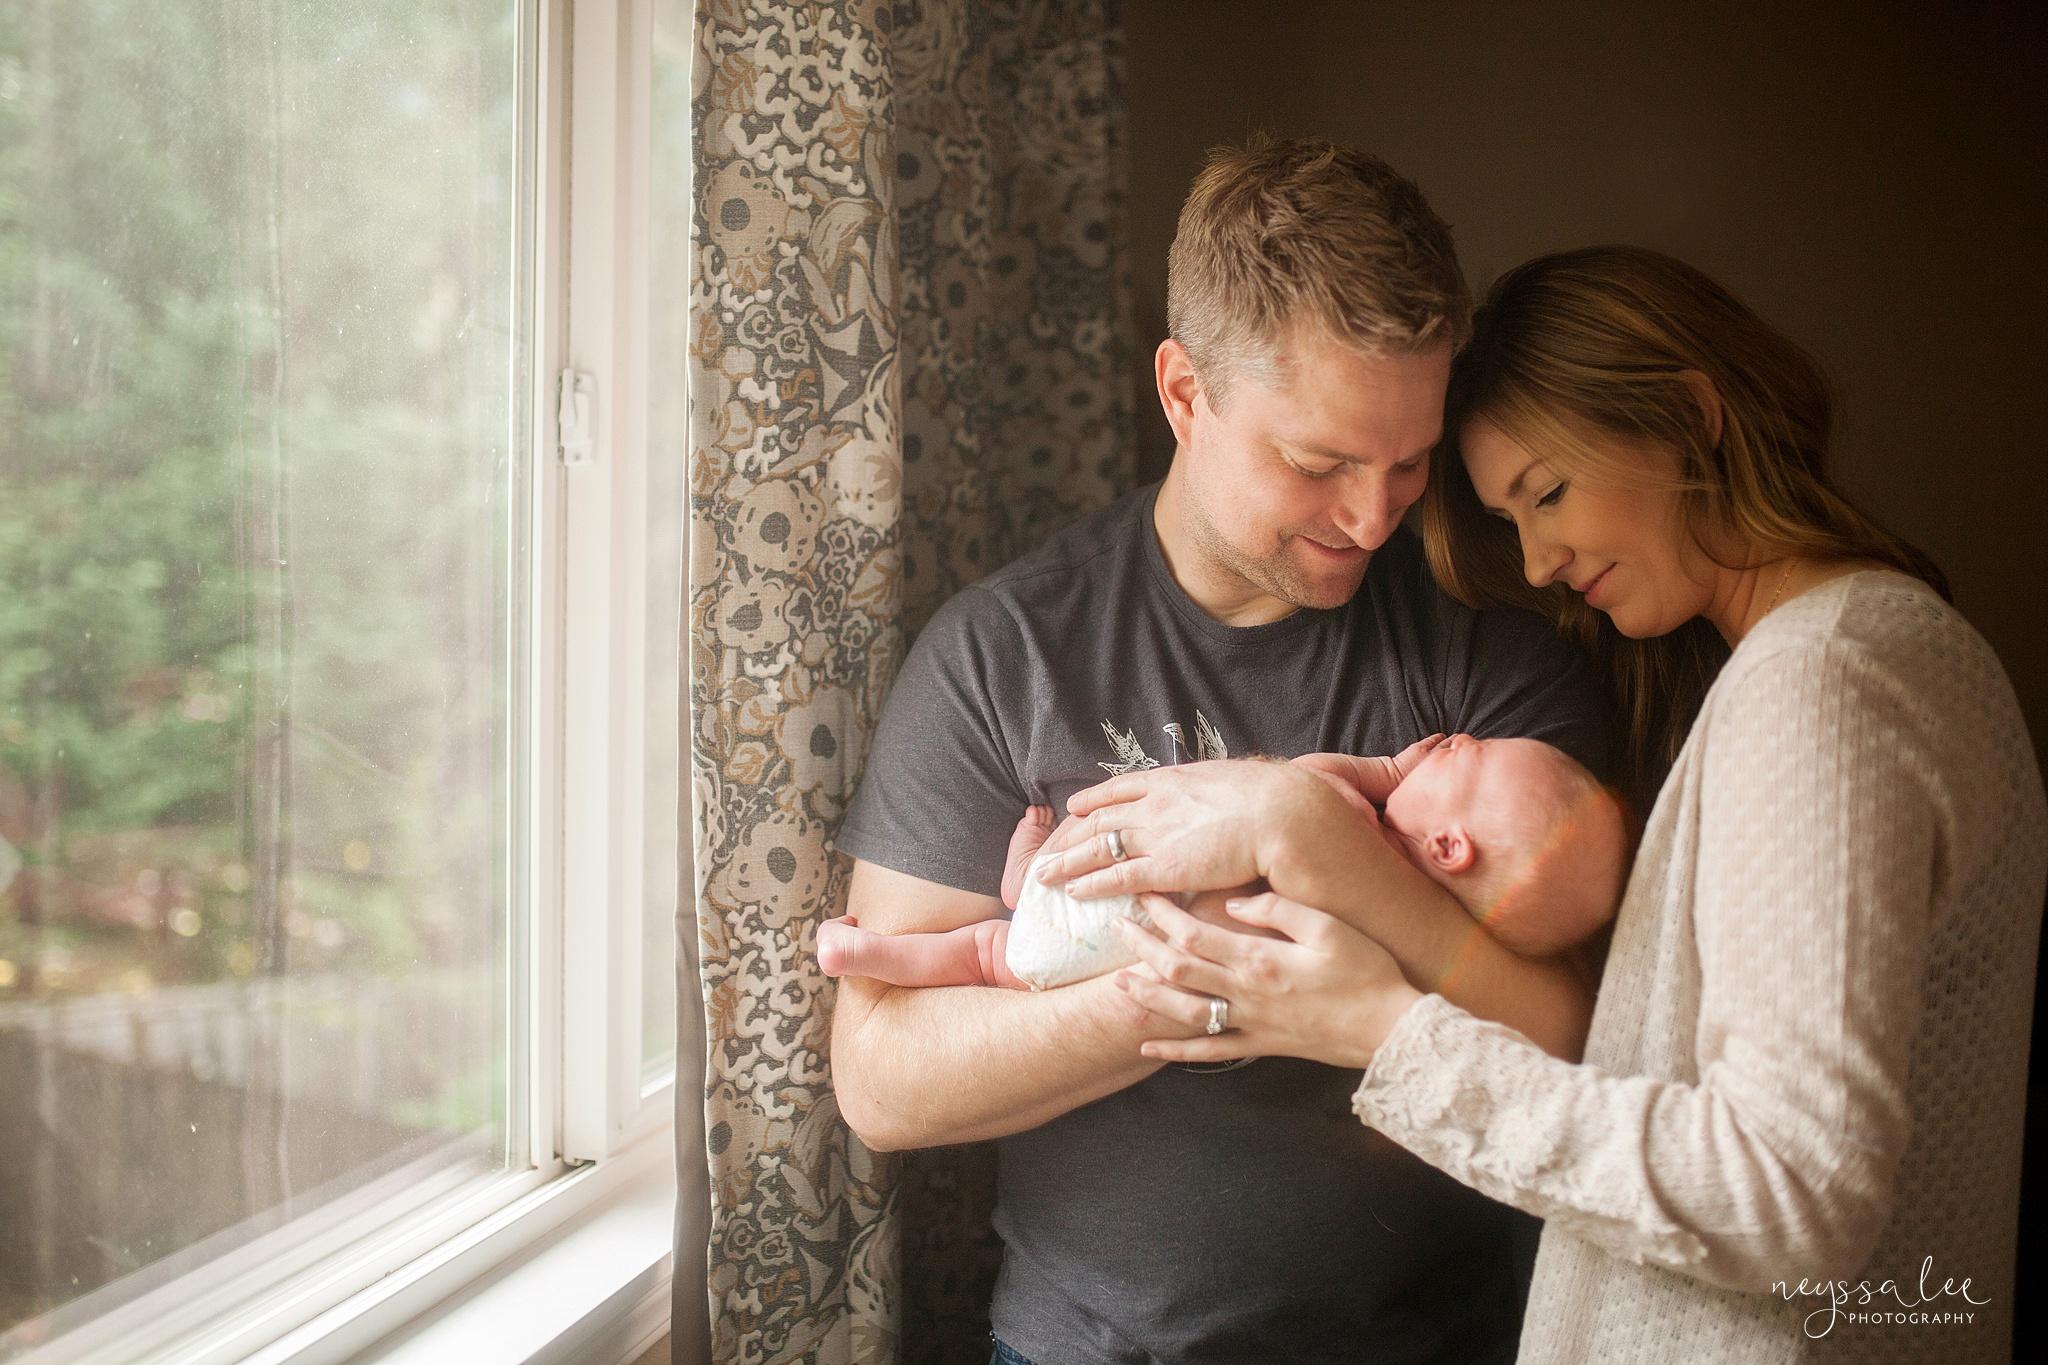 Snoqualmie Newborn Photographer, Neyssa Lee Photography, Newborn boy, lifestyle newborn photo